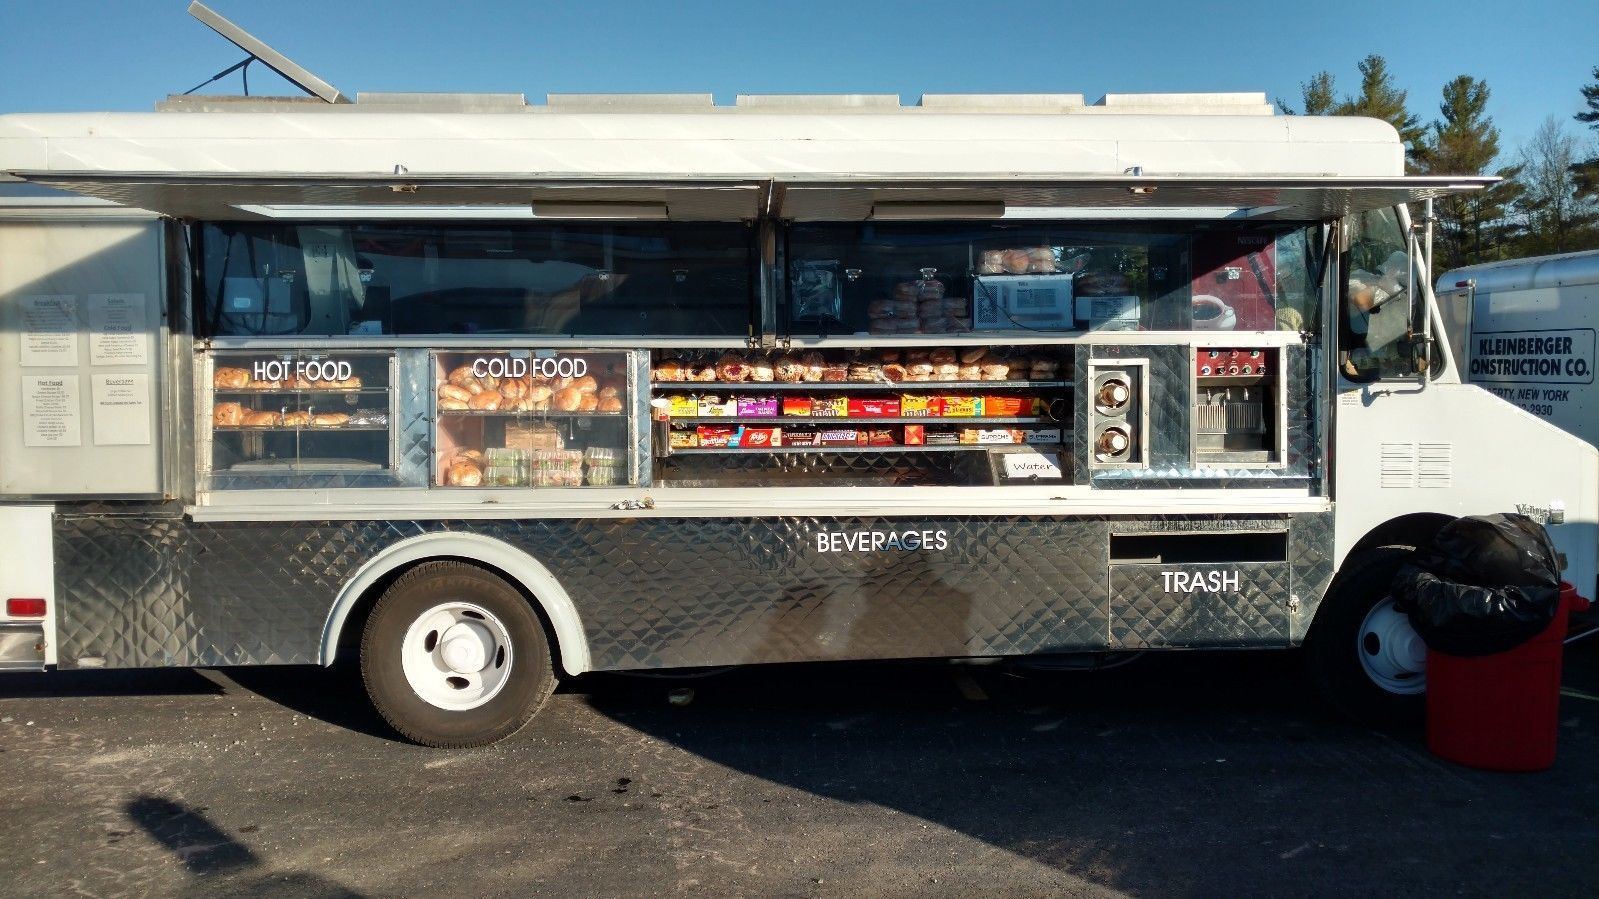 Food truck california style style california truck